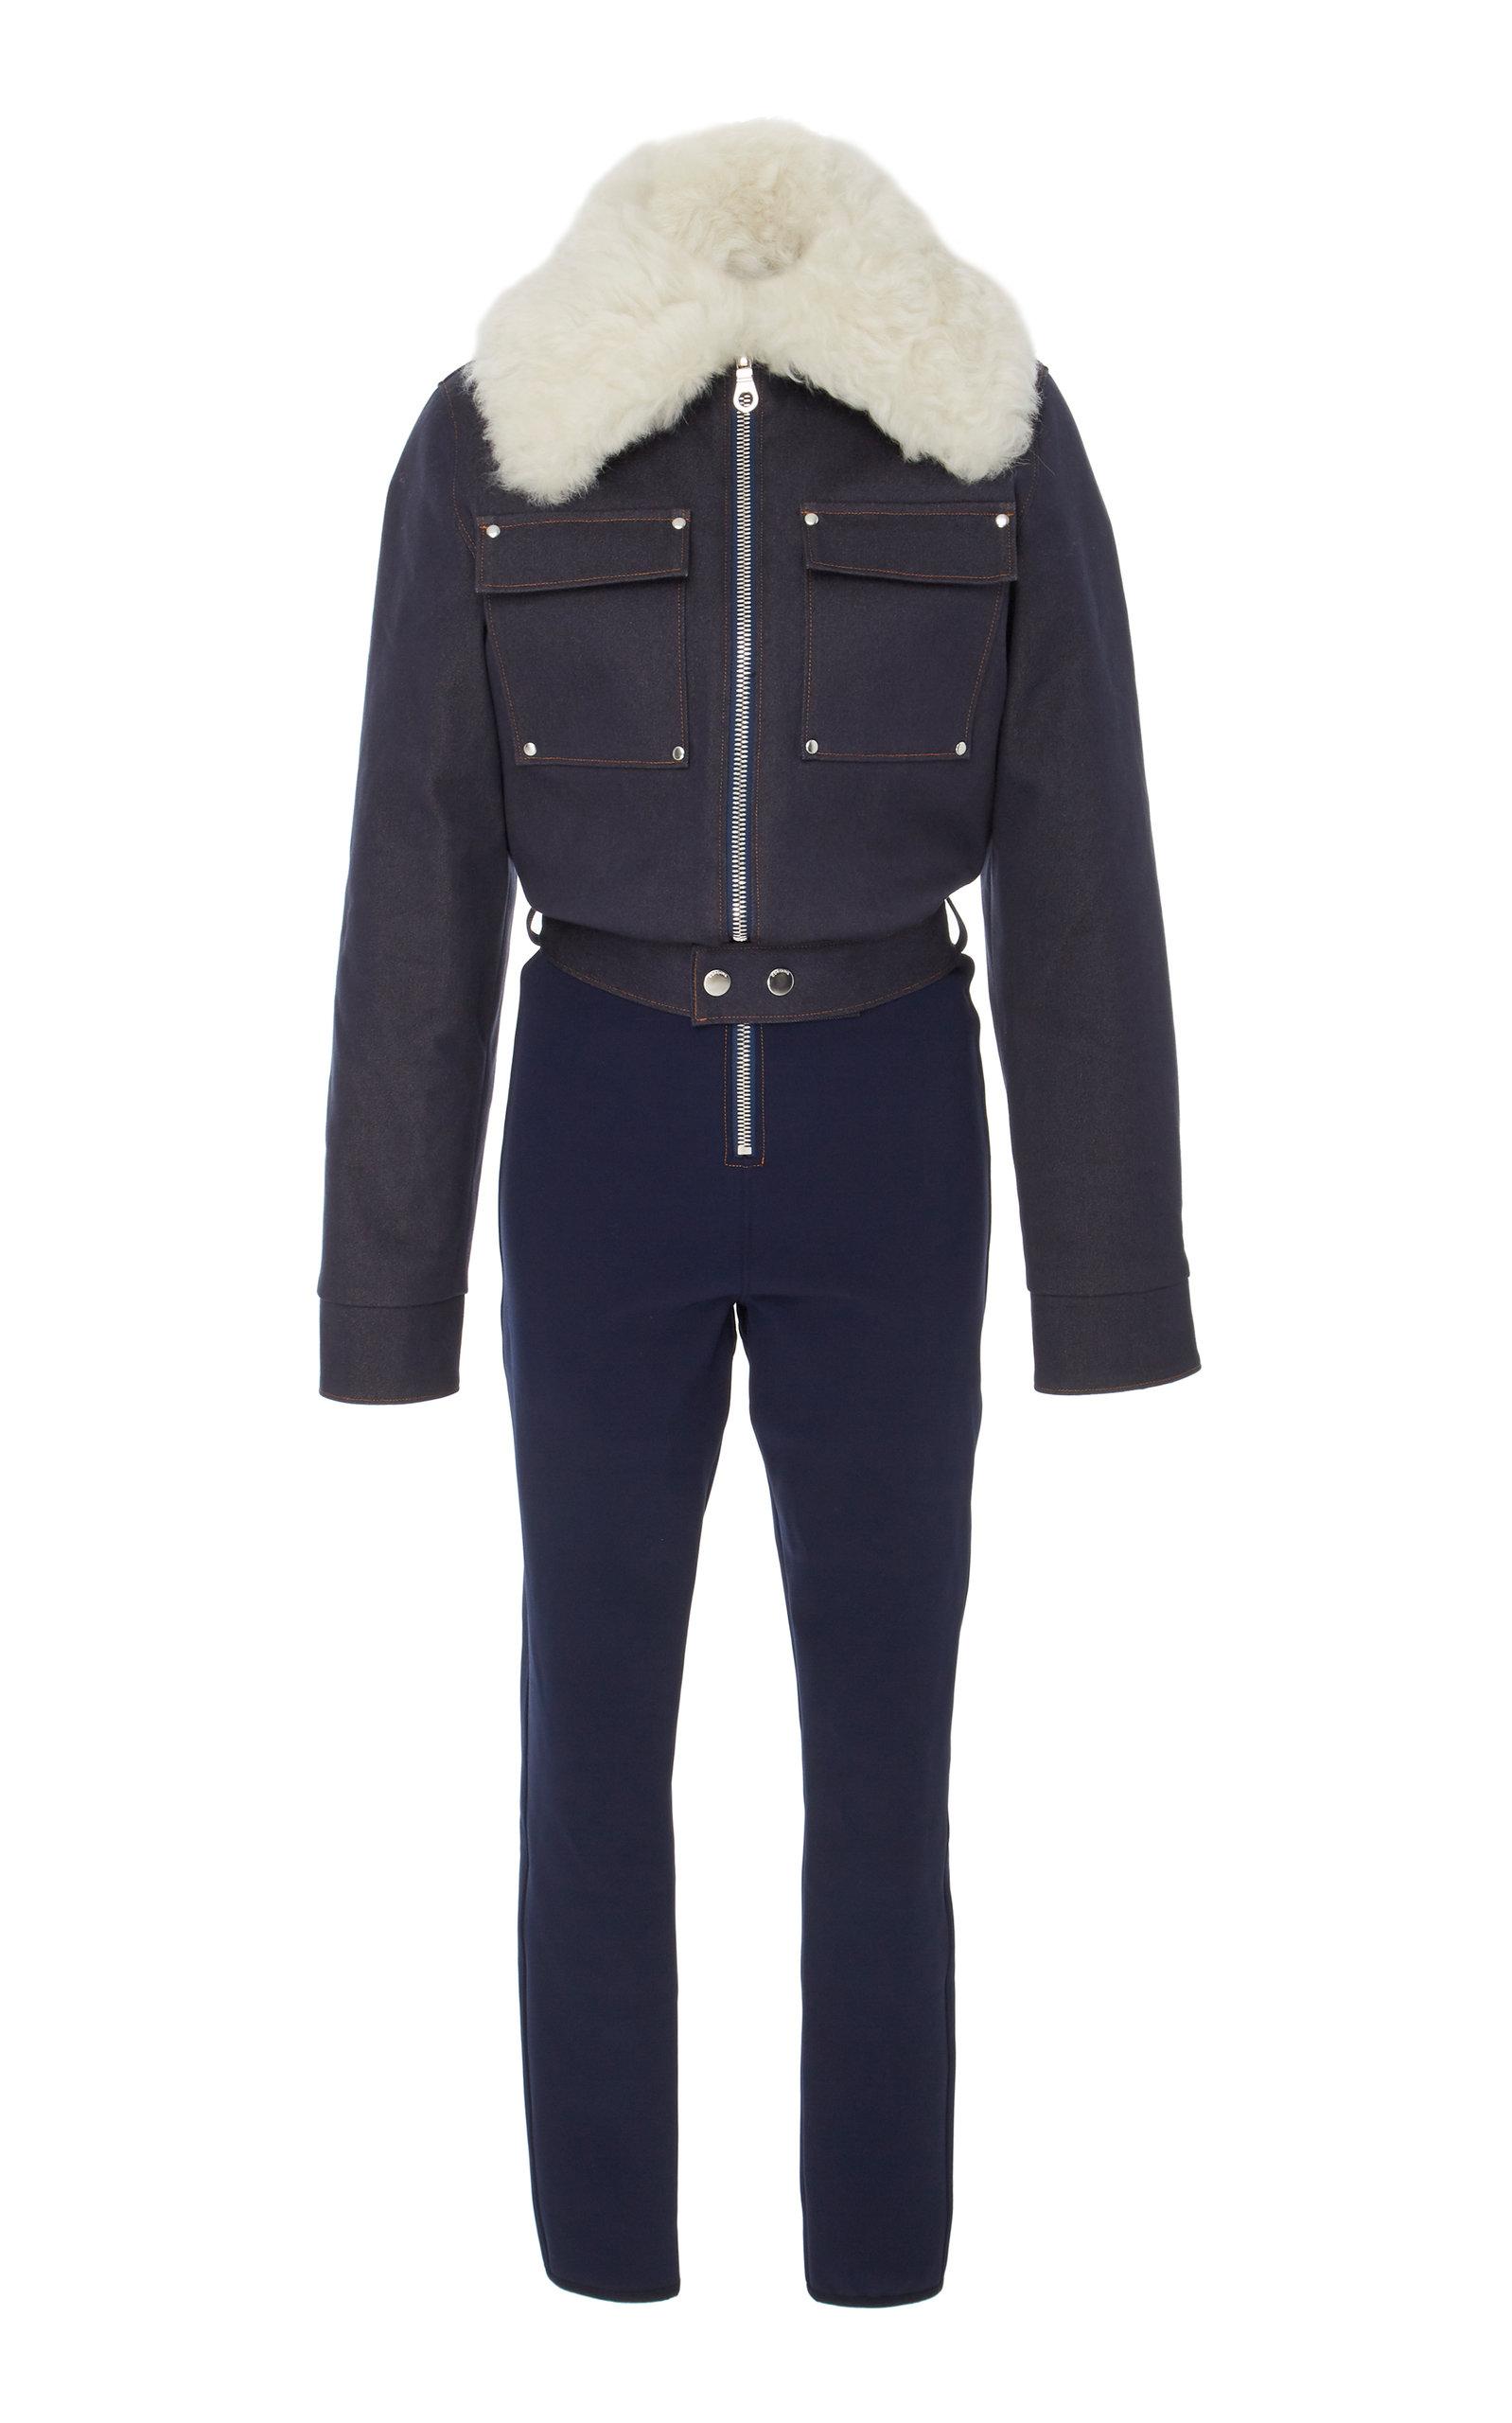 Courchevel Shearling-Trimmed Denim Jumpsuit in Blue